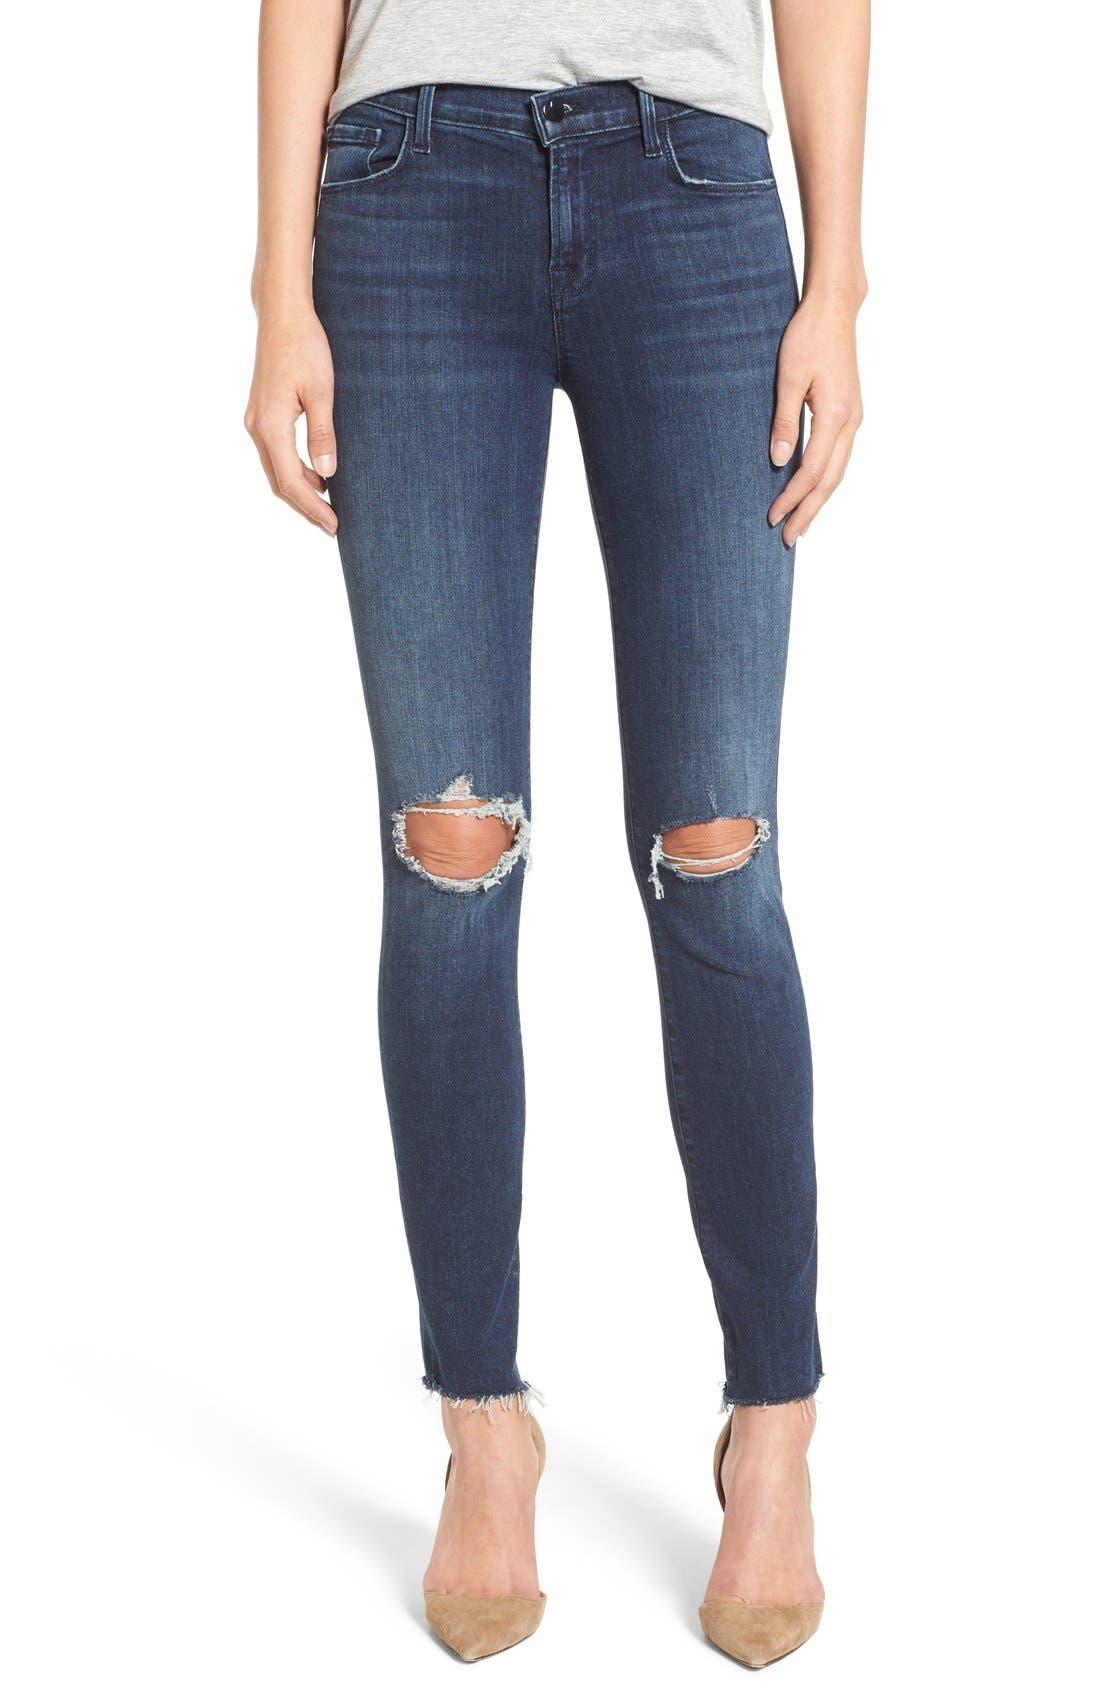 J BRAND '811' Ankle Skinny Jeans, Main, color, 401